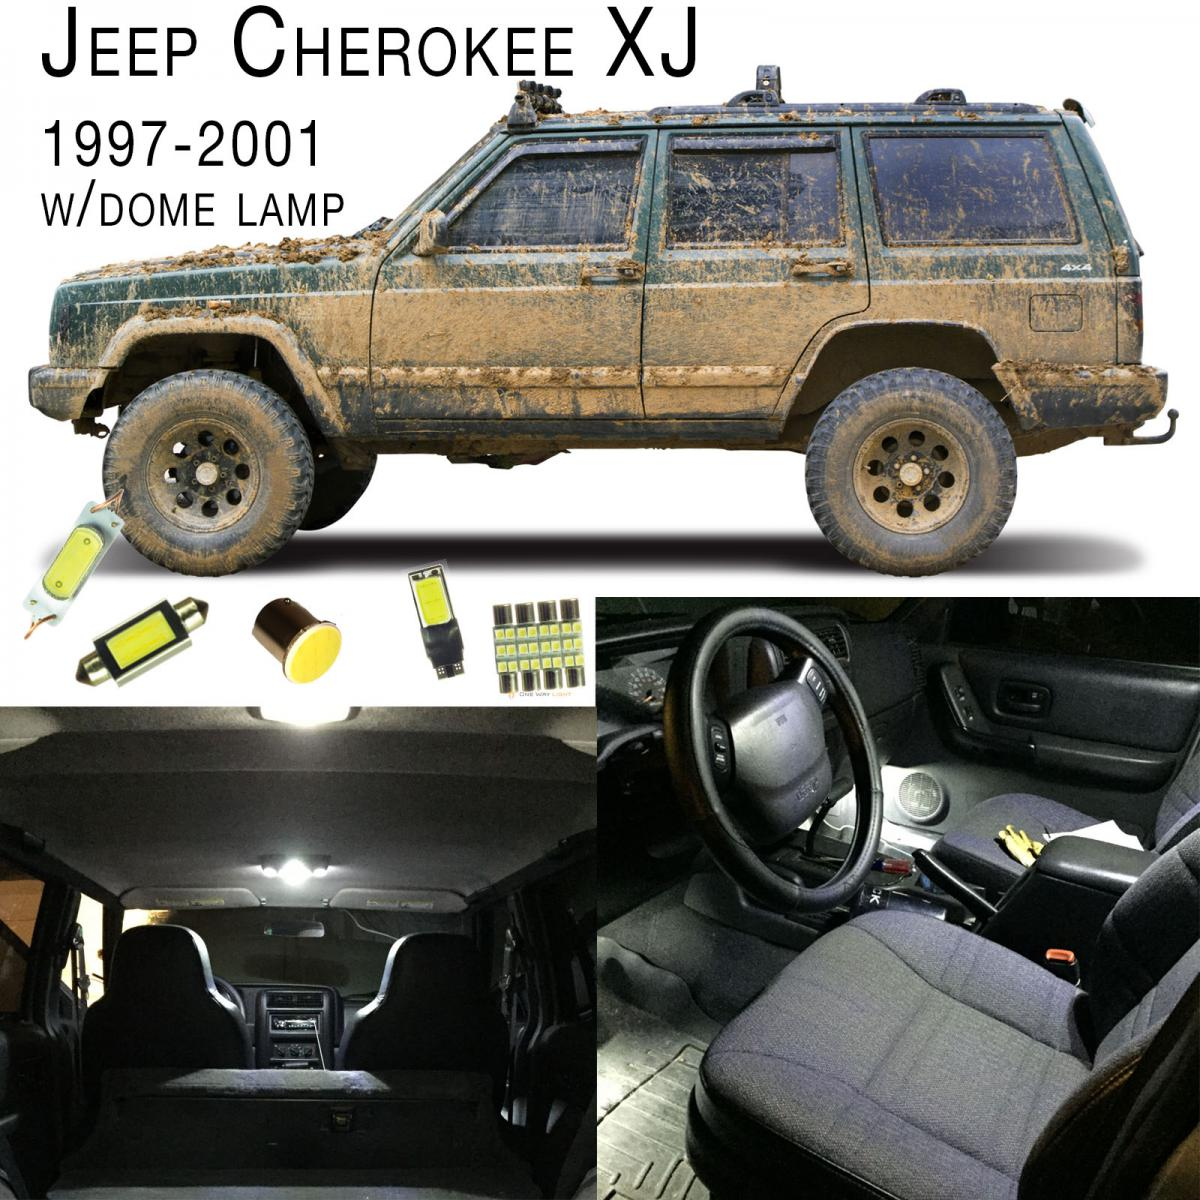 1997 2001 jeep cherokee xj led interior led set white w dome lamp ebay for Jeep cherokee xj interior accessories